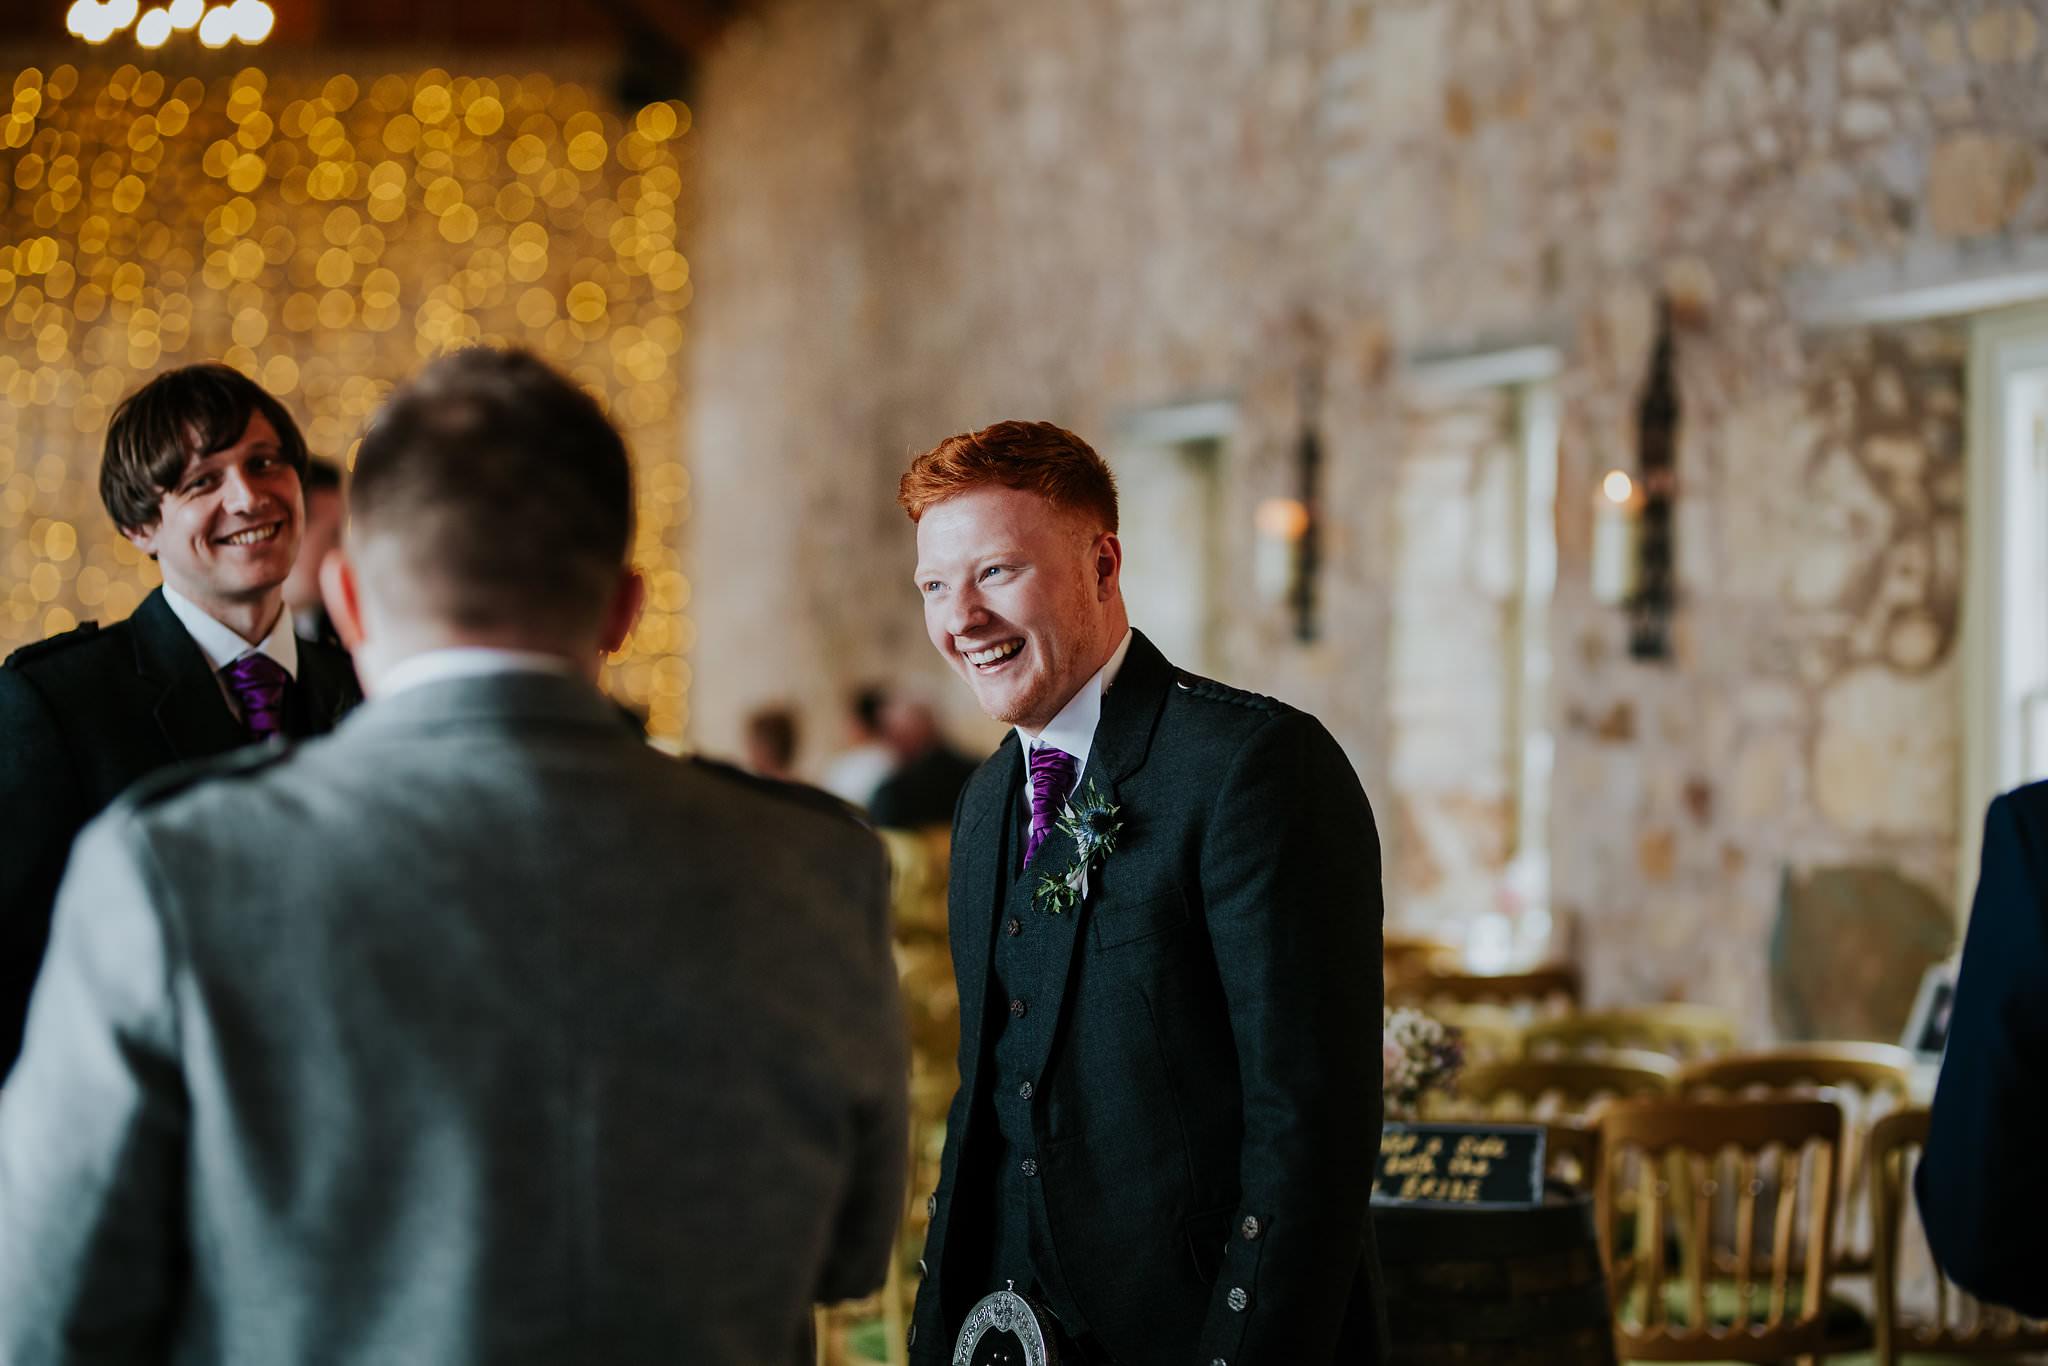 kirknewton stables wedding photographer (19).jpg